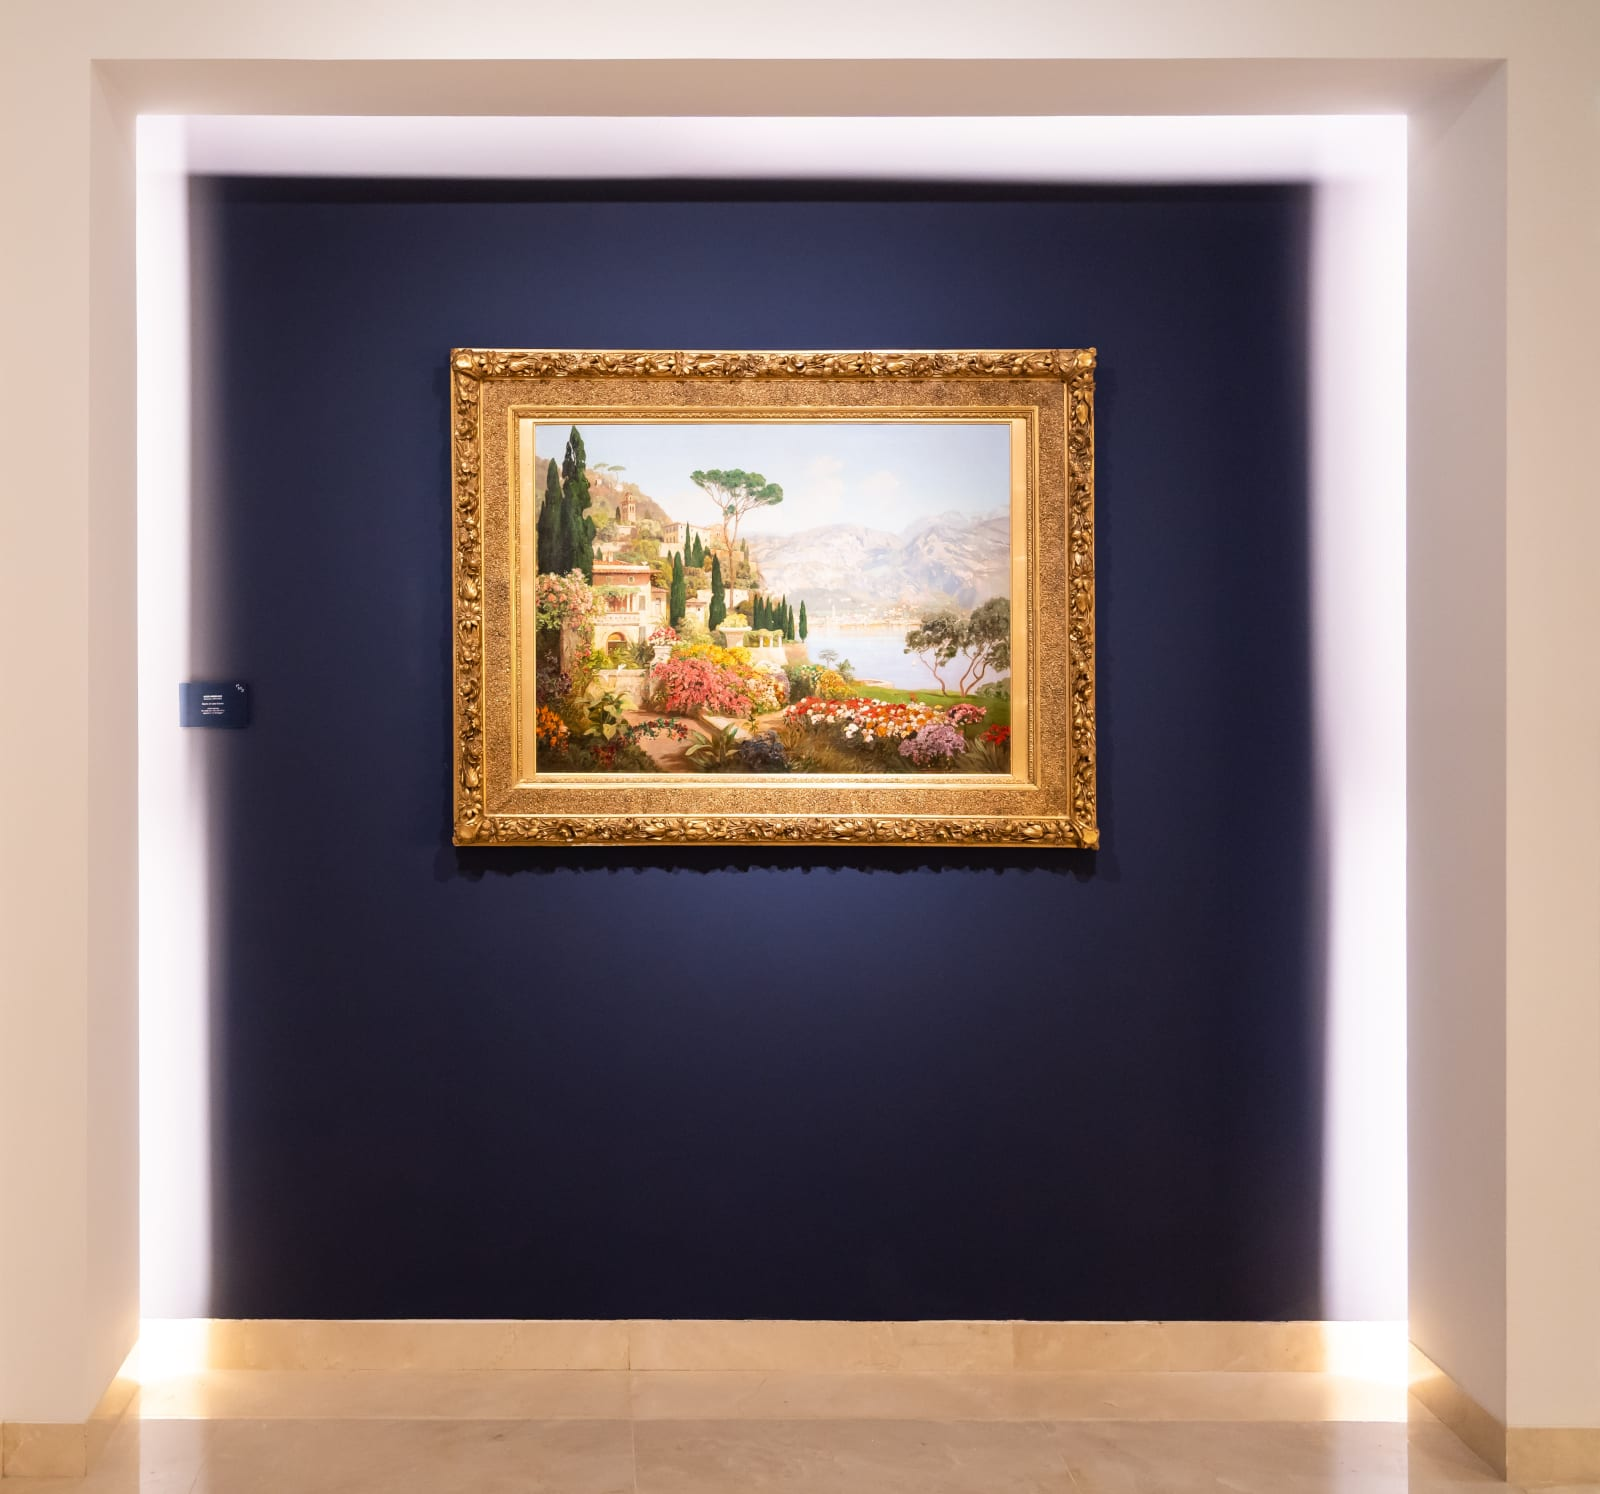 ALOIS ARNEGGER (Austrian, 1879-1963) Scene on Lake Garda Oil on Canvas 74 x 100 cm / 29 x 39 1/3 in. Signed l.l.